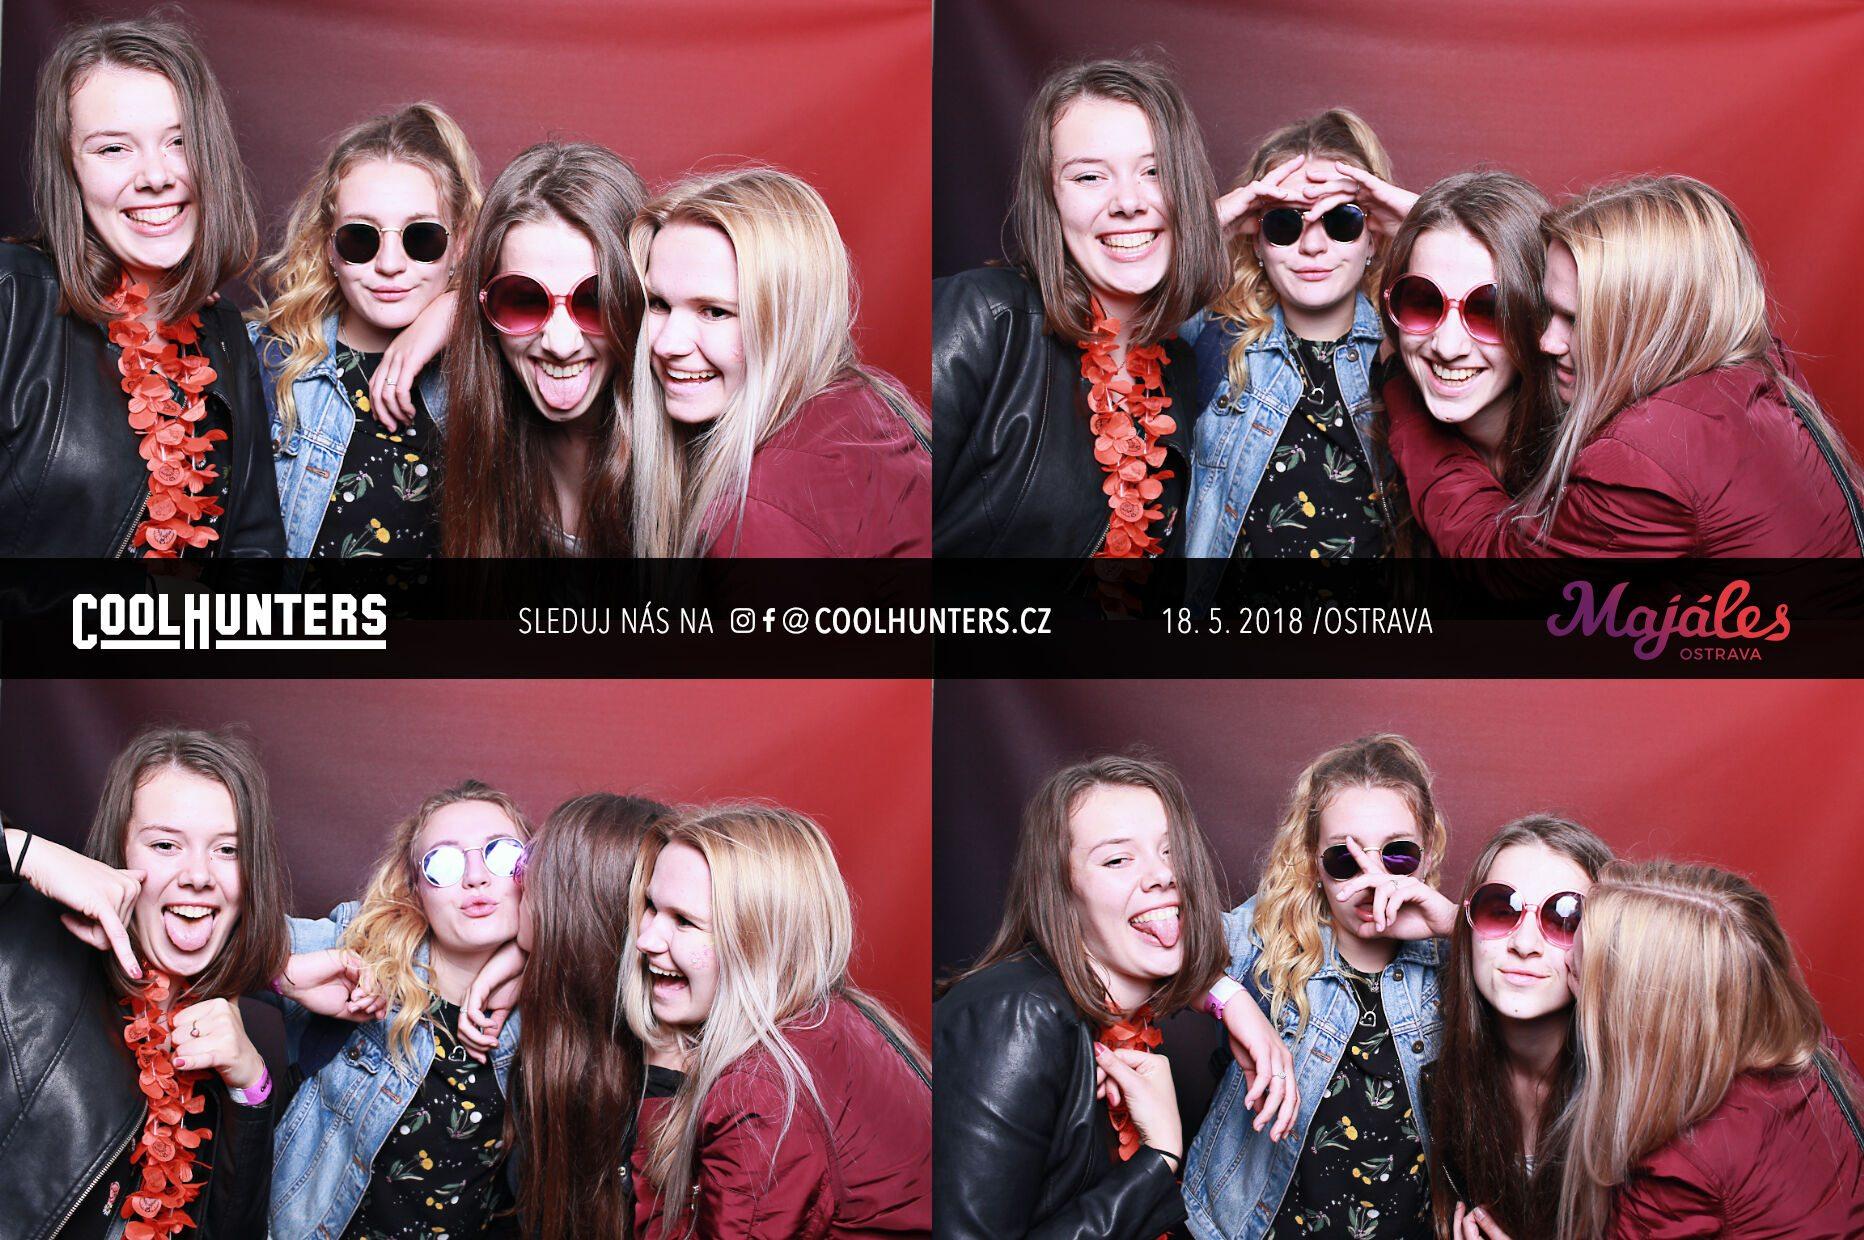 fotokoutek-coolhunters-majales-ostrava-18-5-2018-419304